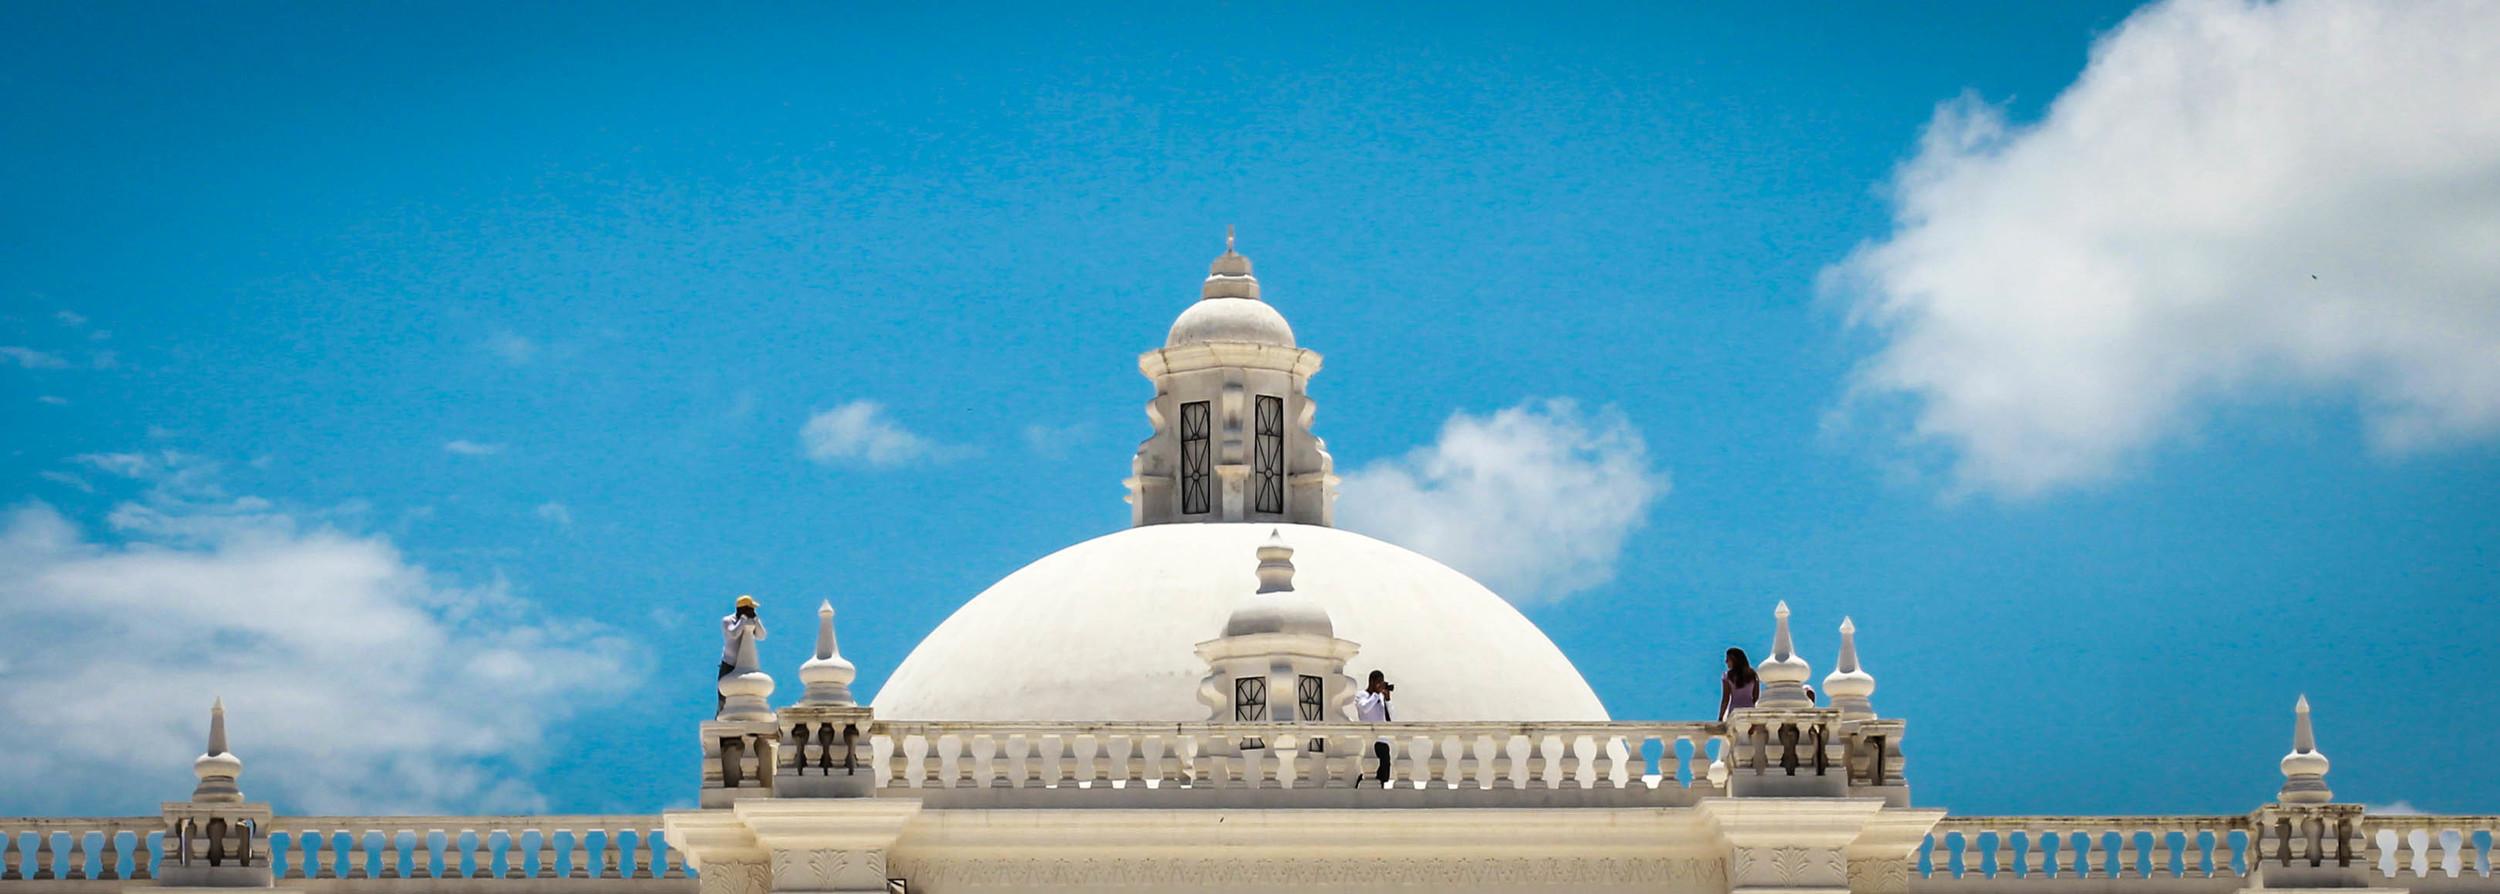 cathedral-photo-leon-nicaragua